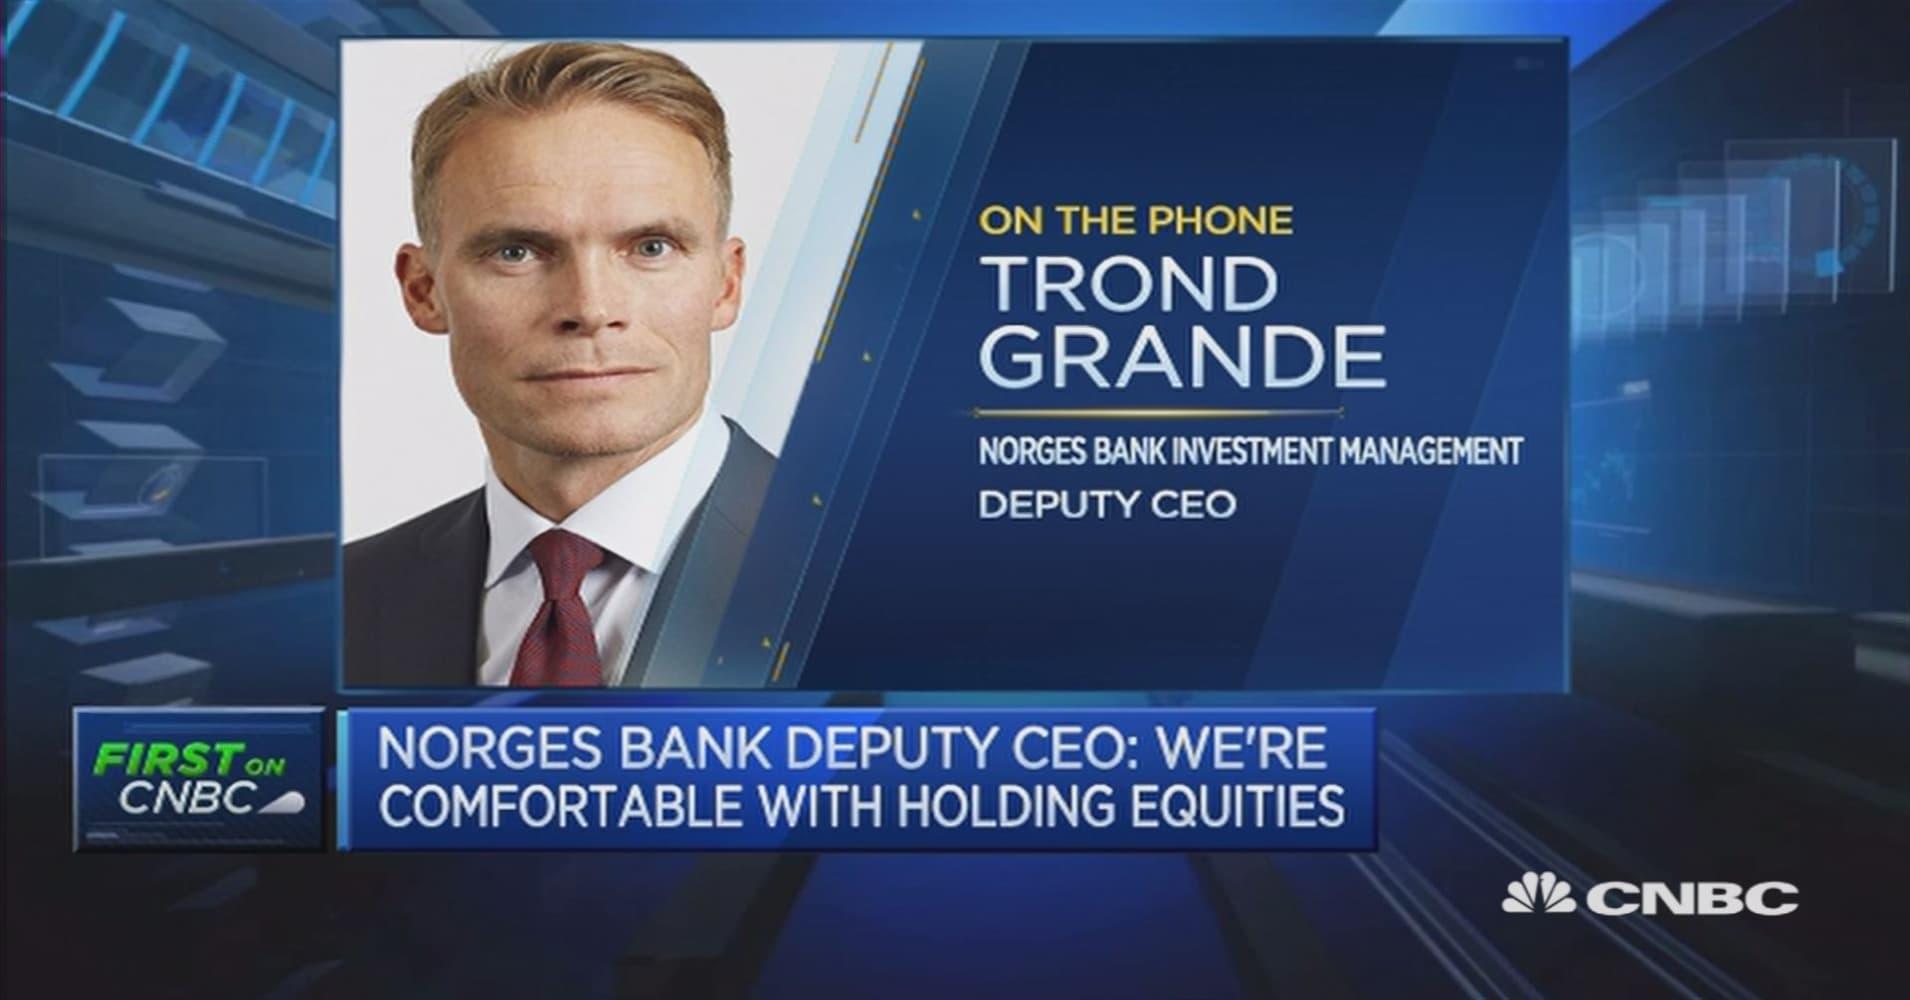 Norges bank investment management singapore linkedin jobs forex indicators metatrader